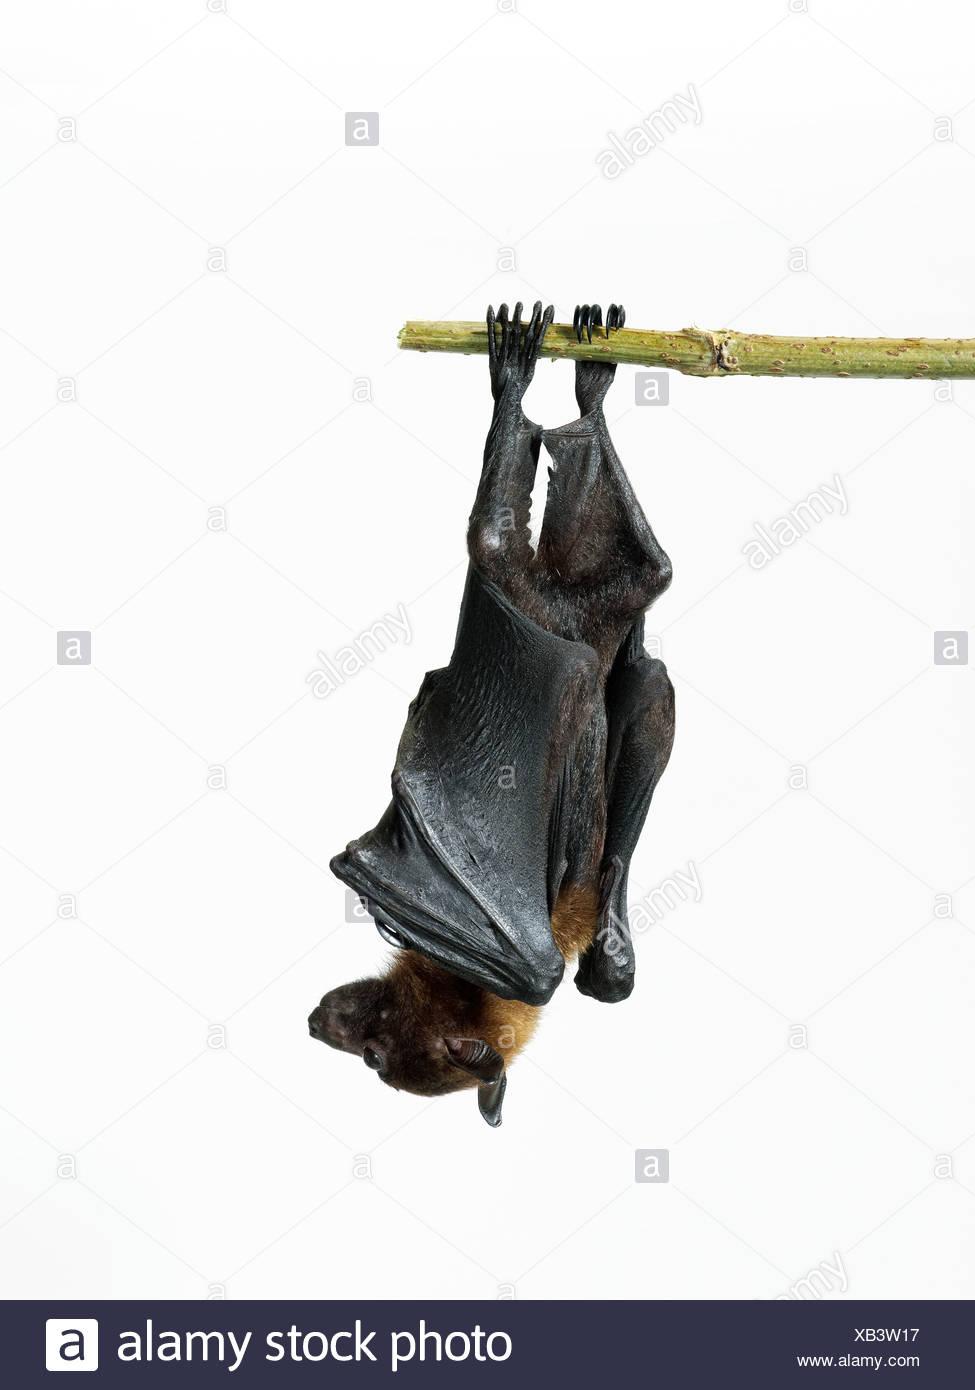 Lyle's fruit bat - Pteropus lylei Stock Photo